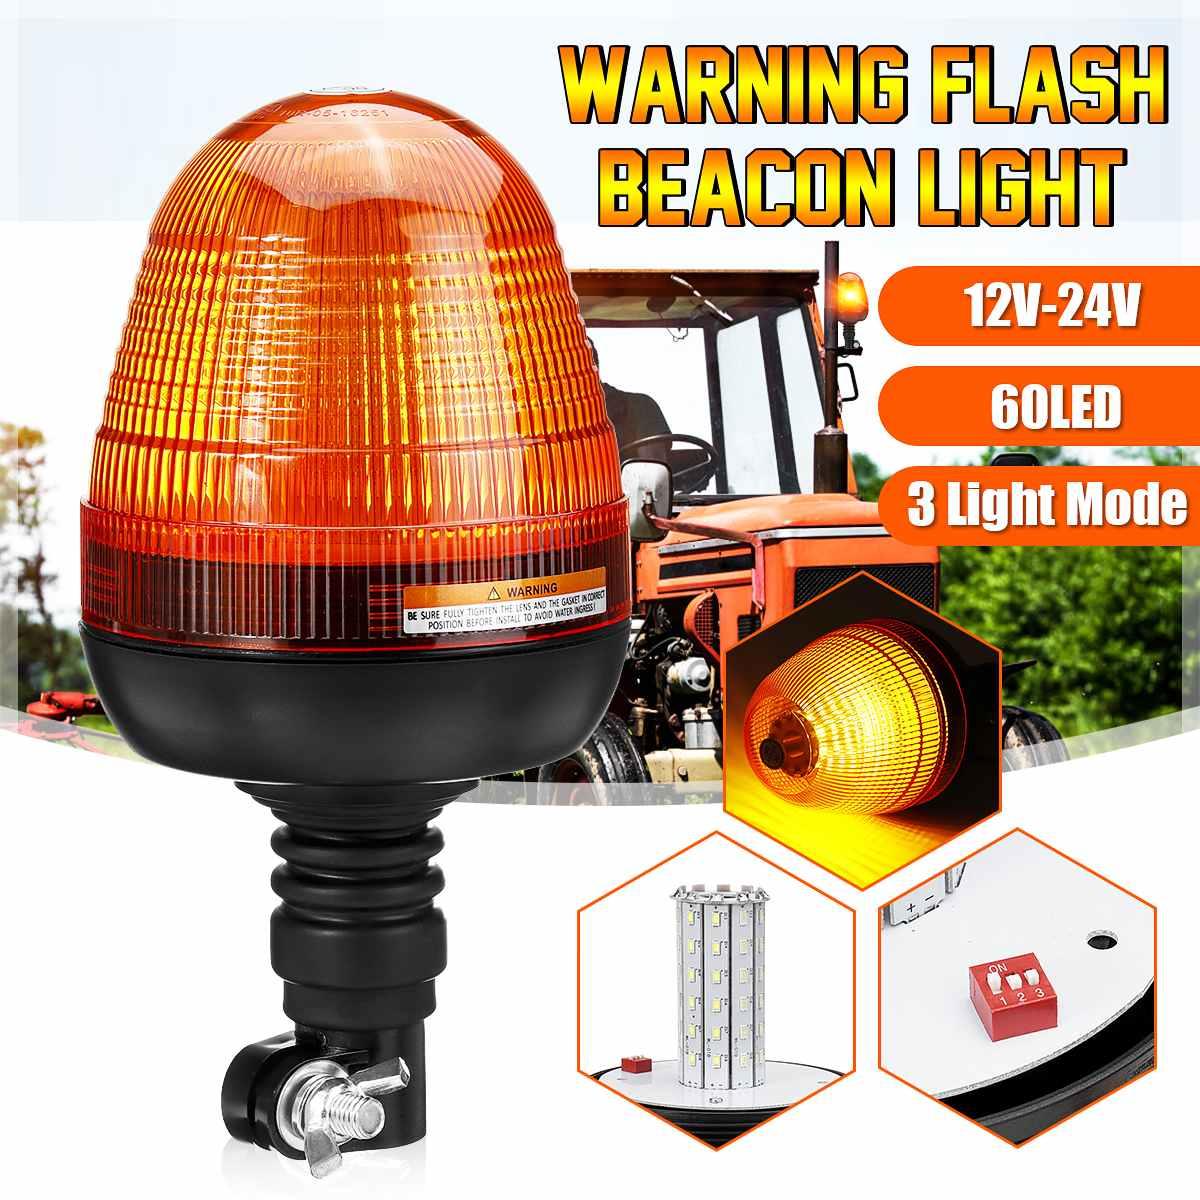 3 Modes 12V 24V 60 LED Car Rotating Flashing Beacon Light Flexible Warning Light Emergency Lamps Amber Tractor Truck SUV Boat